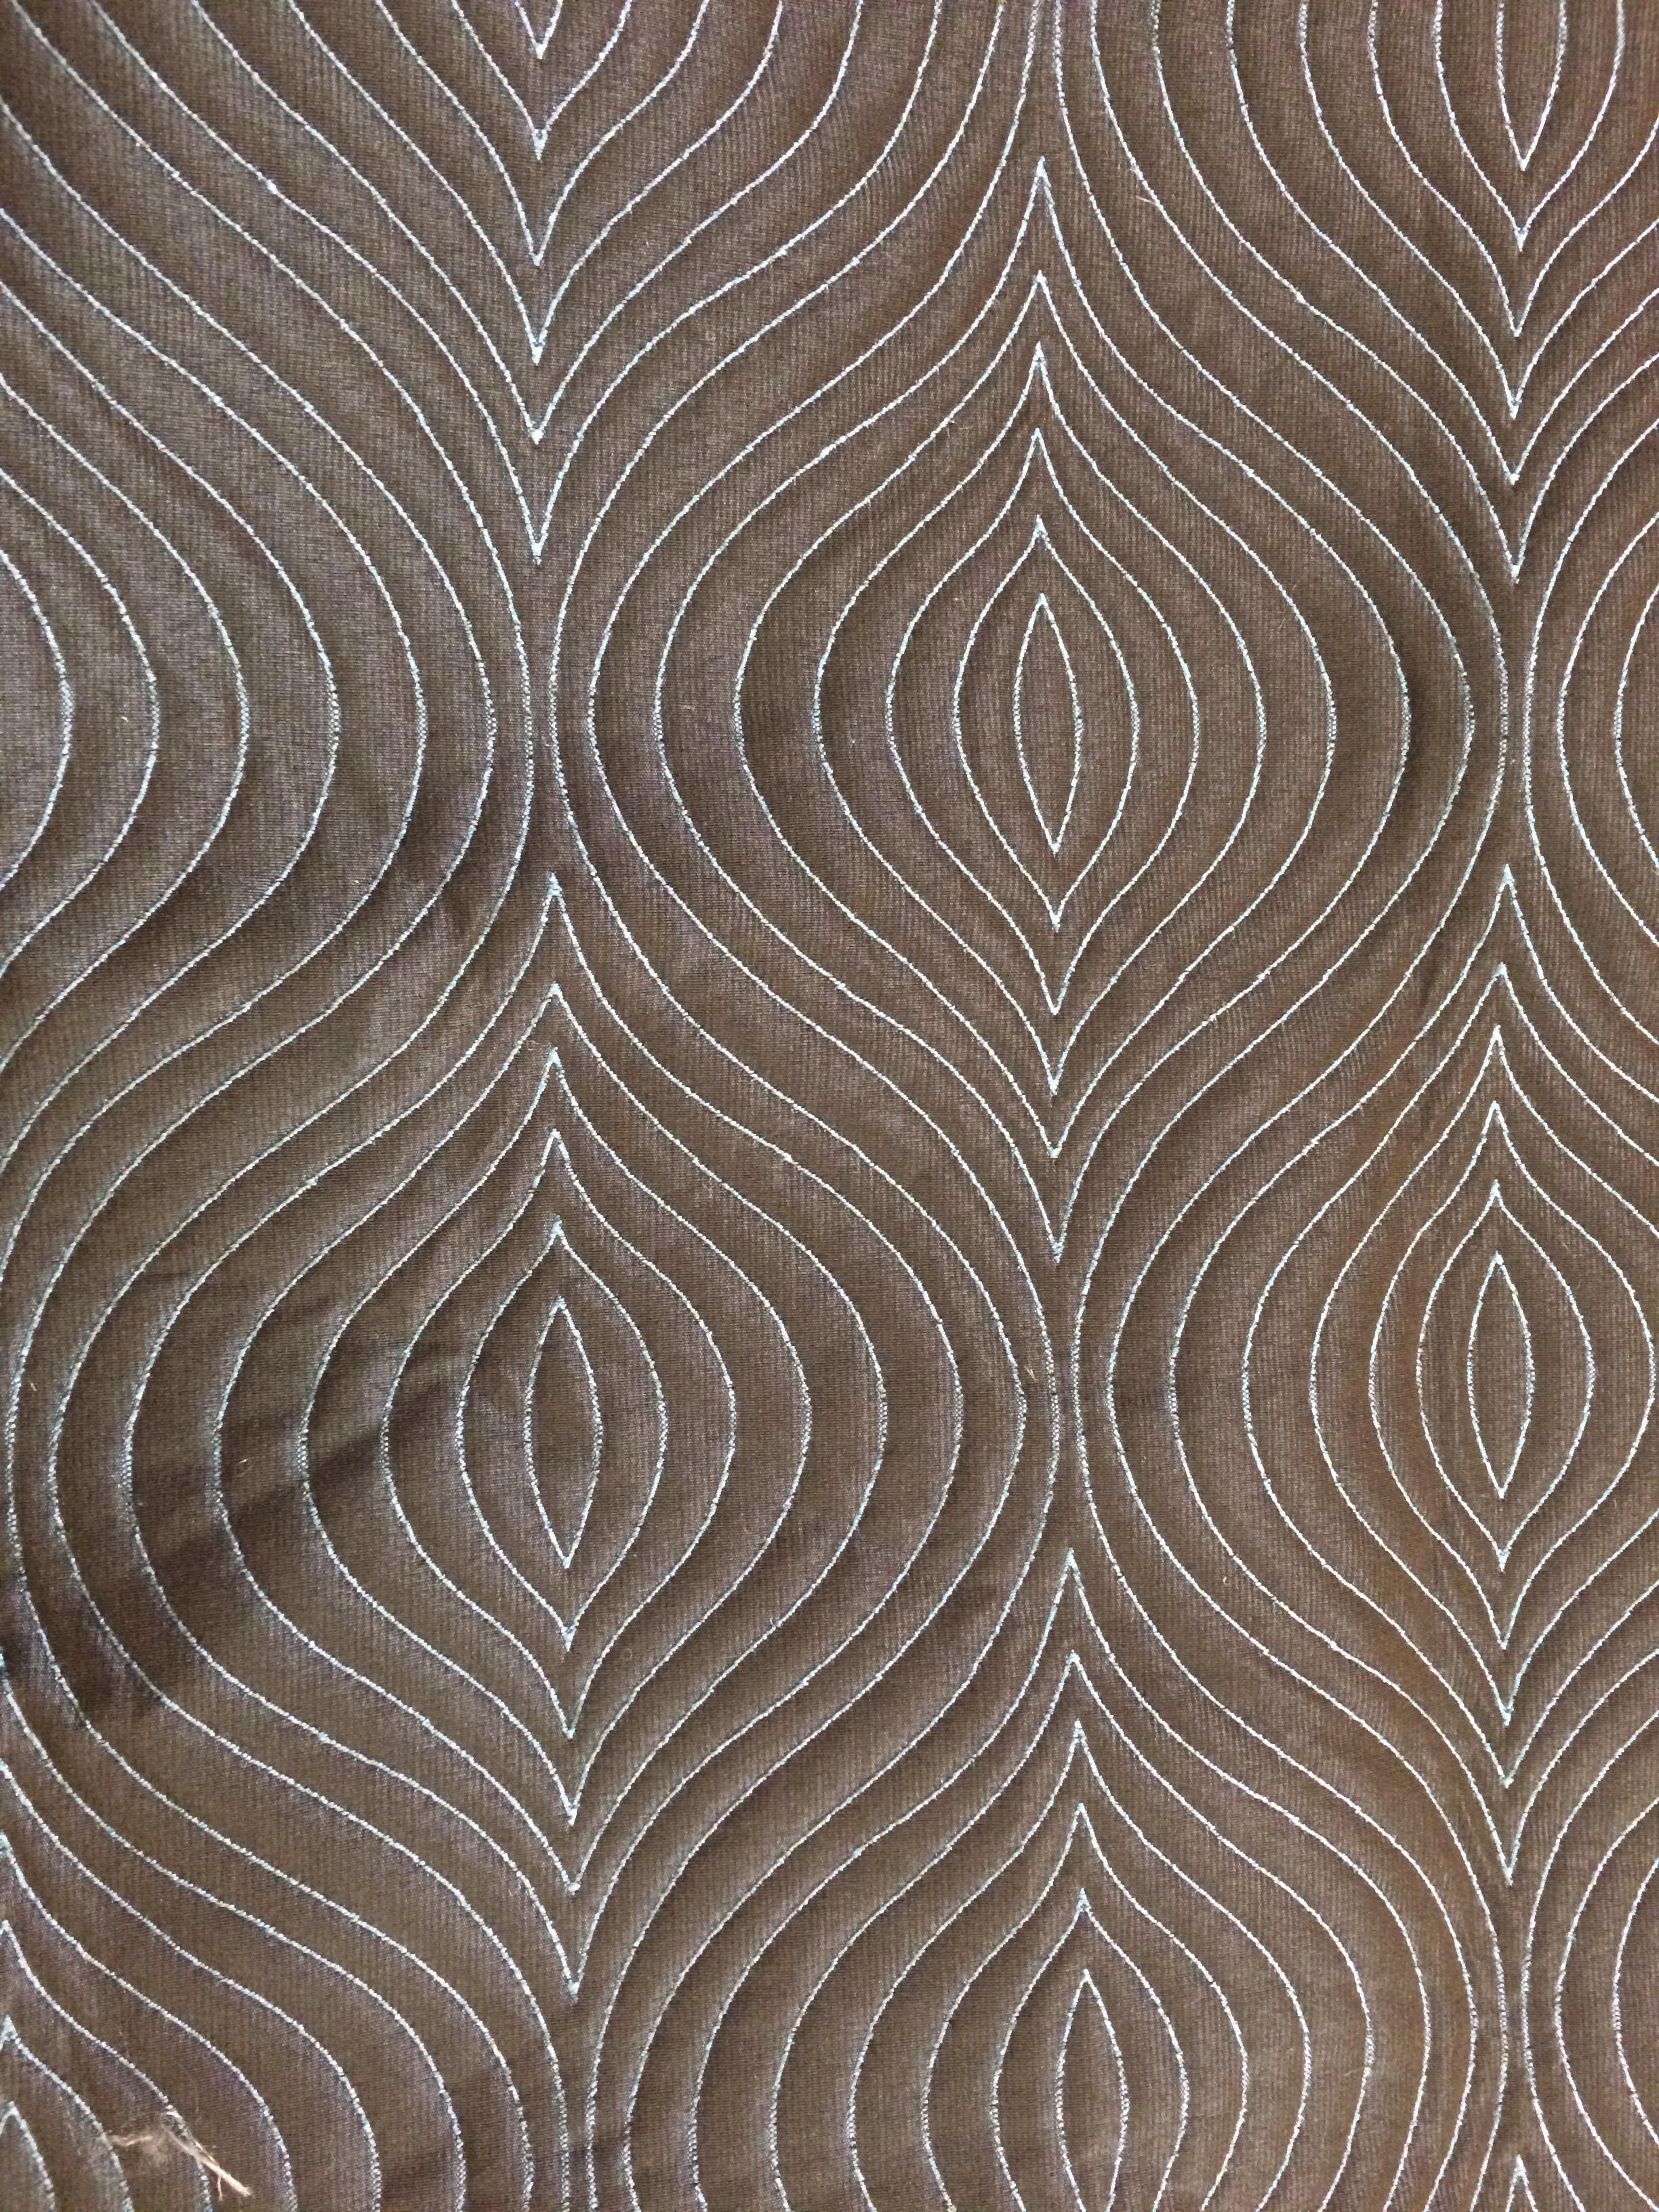 Charcle grey linen